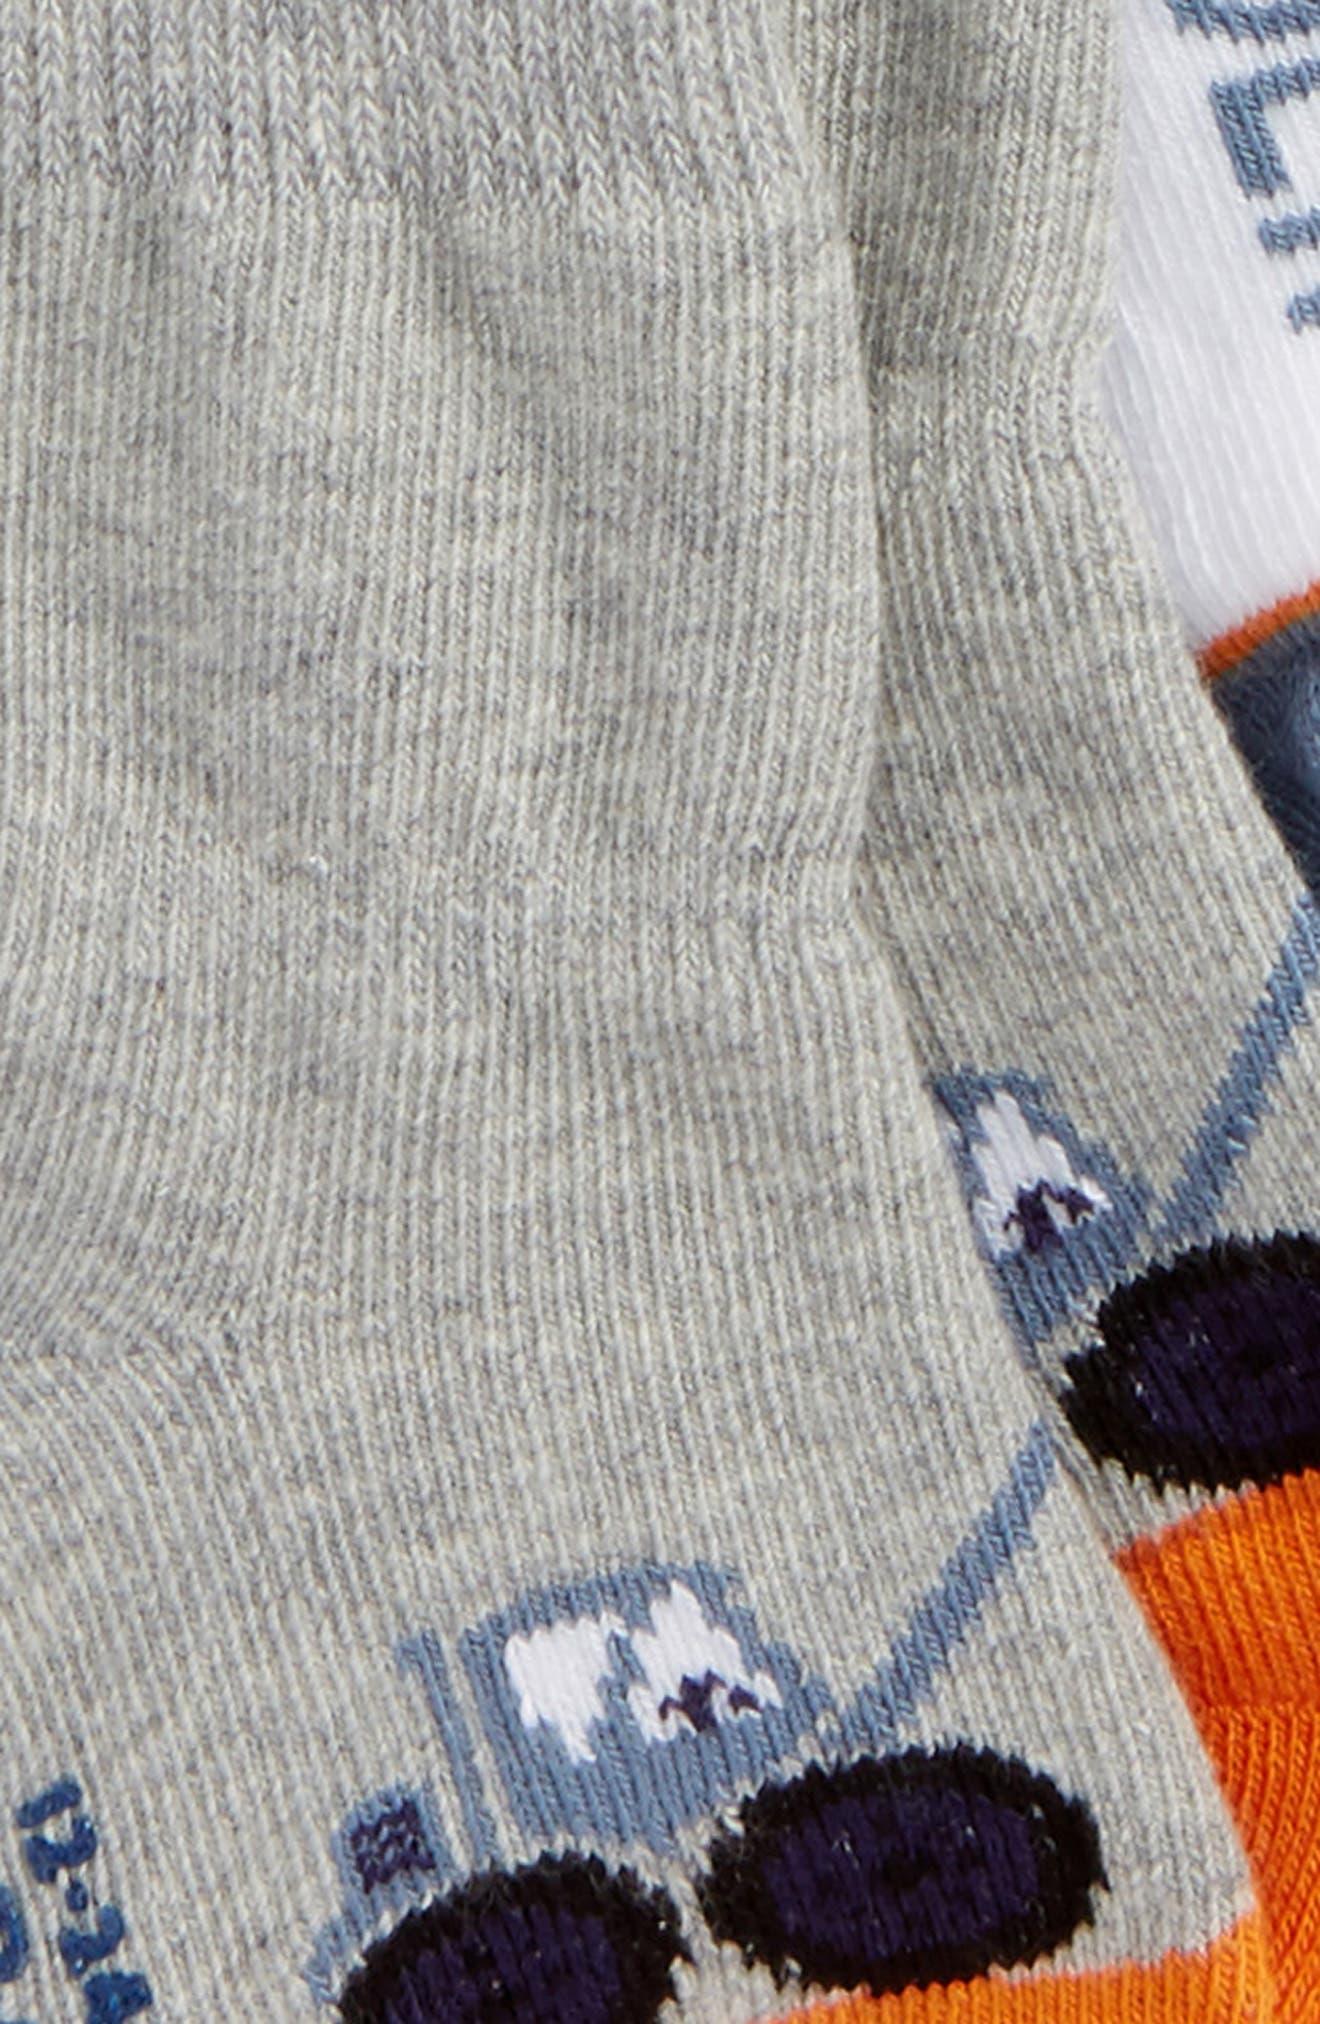 Big Digger 3-Pack Socks,                             Alternate thumbnail 2, color,                             BLUE/ GRAY/ ORANGE/ WHITE